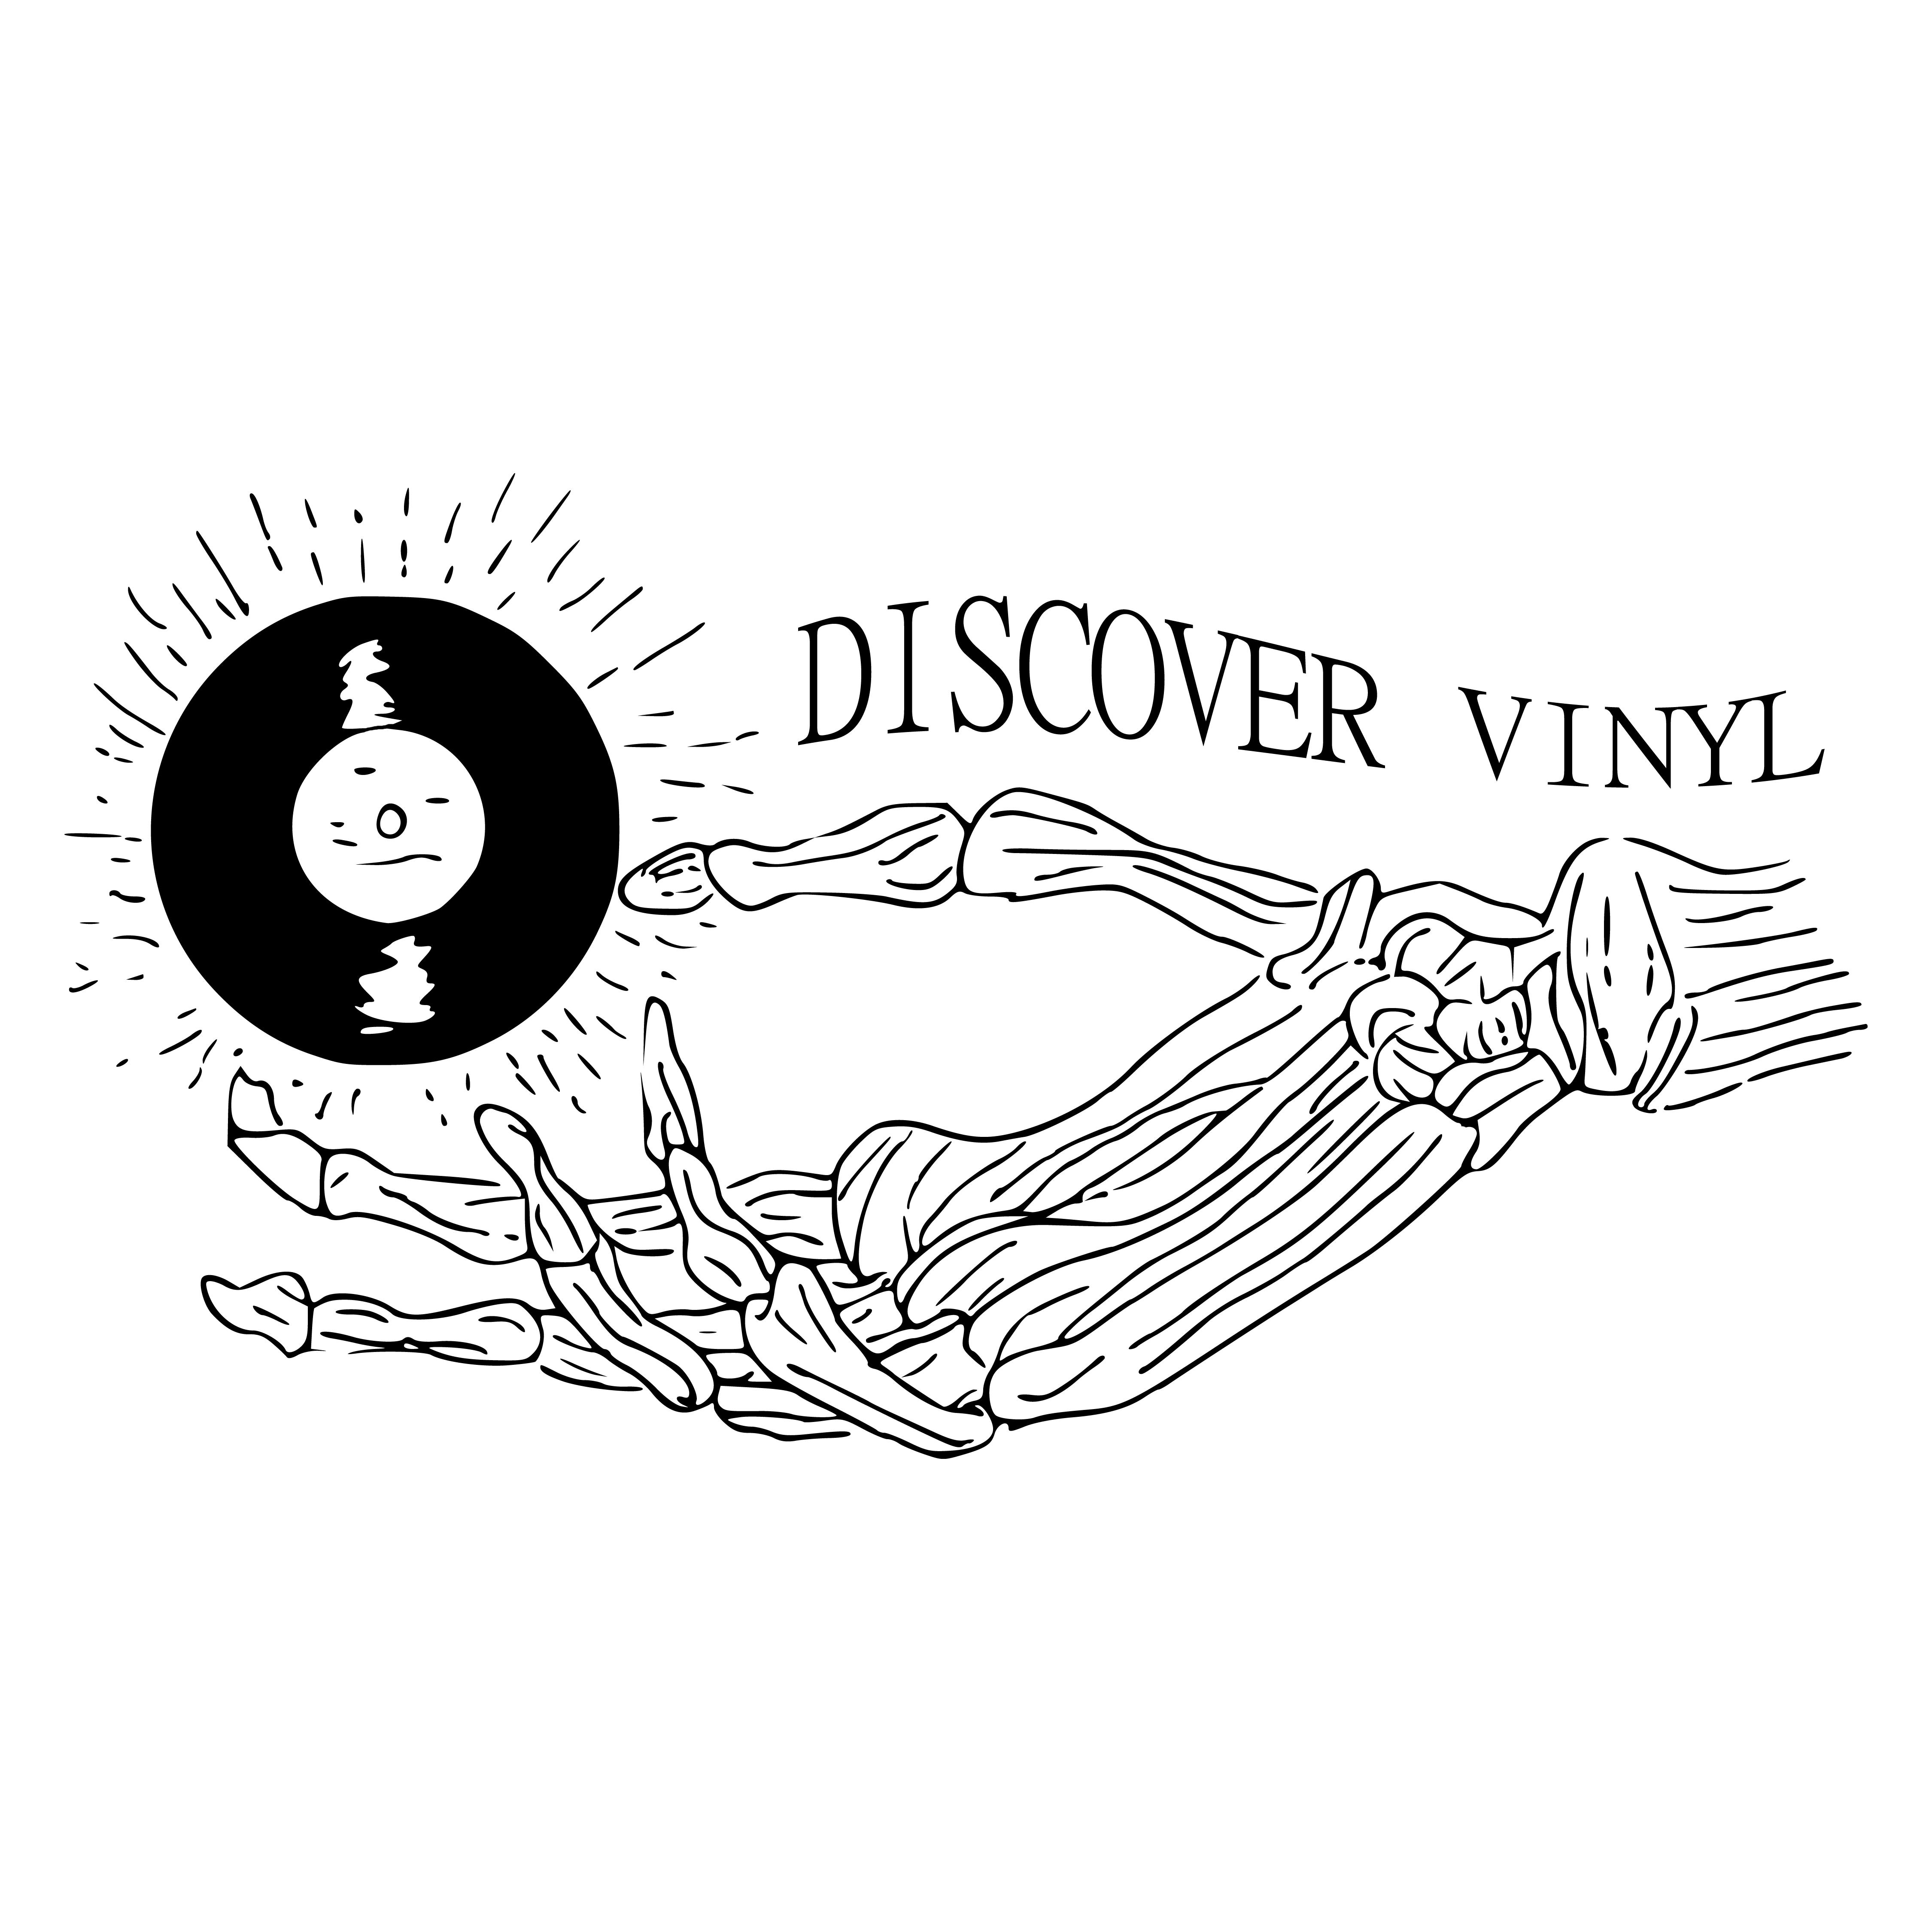 @discovervinyl's cover photo for 'Vinyl News | Home | Discover Vinyl'